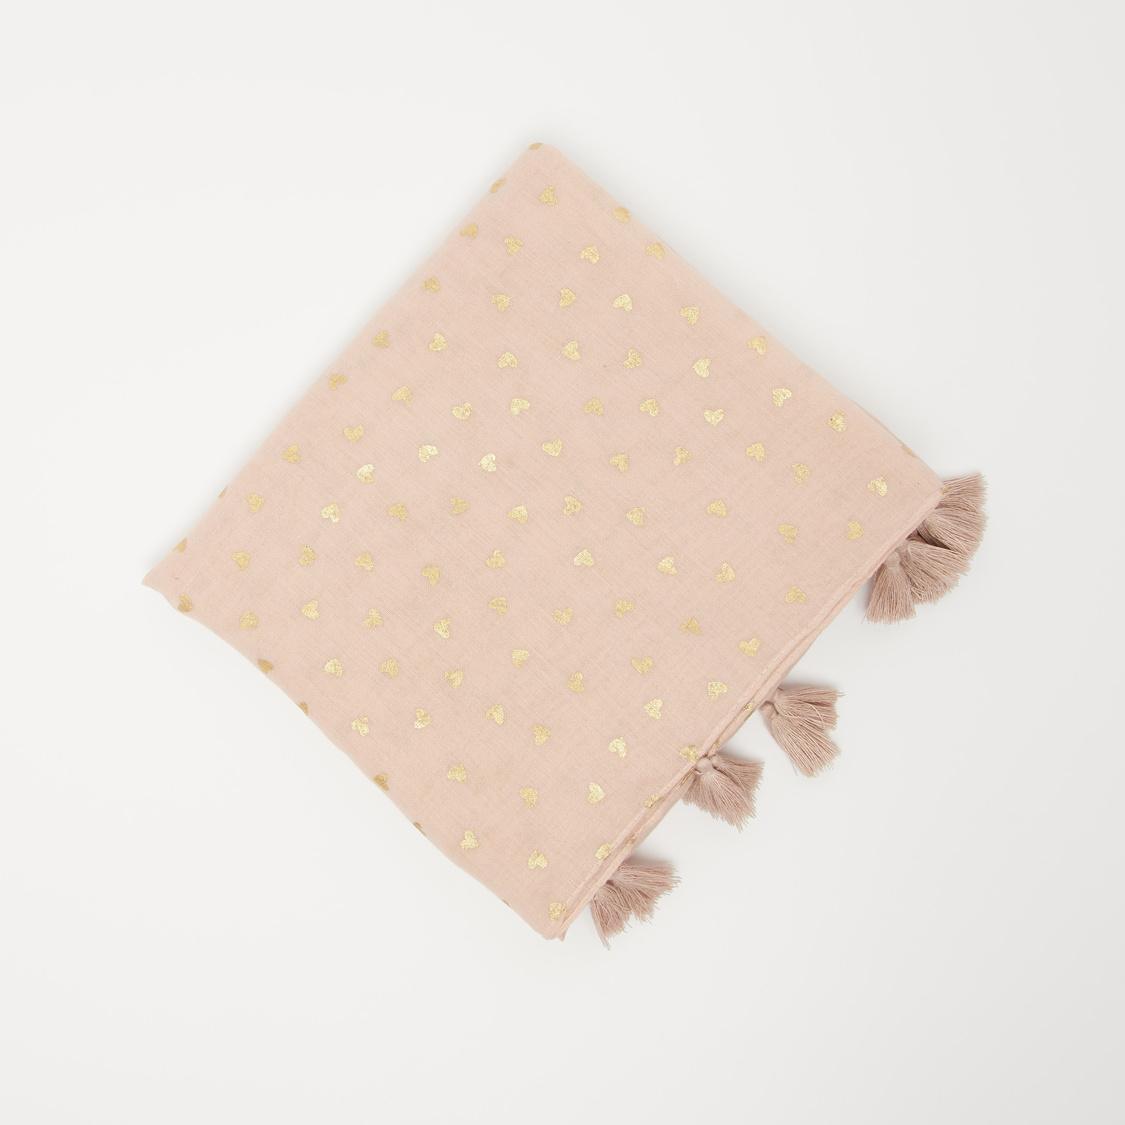 Heart Print Rectangular Scarf with Tassels